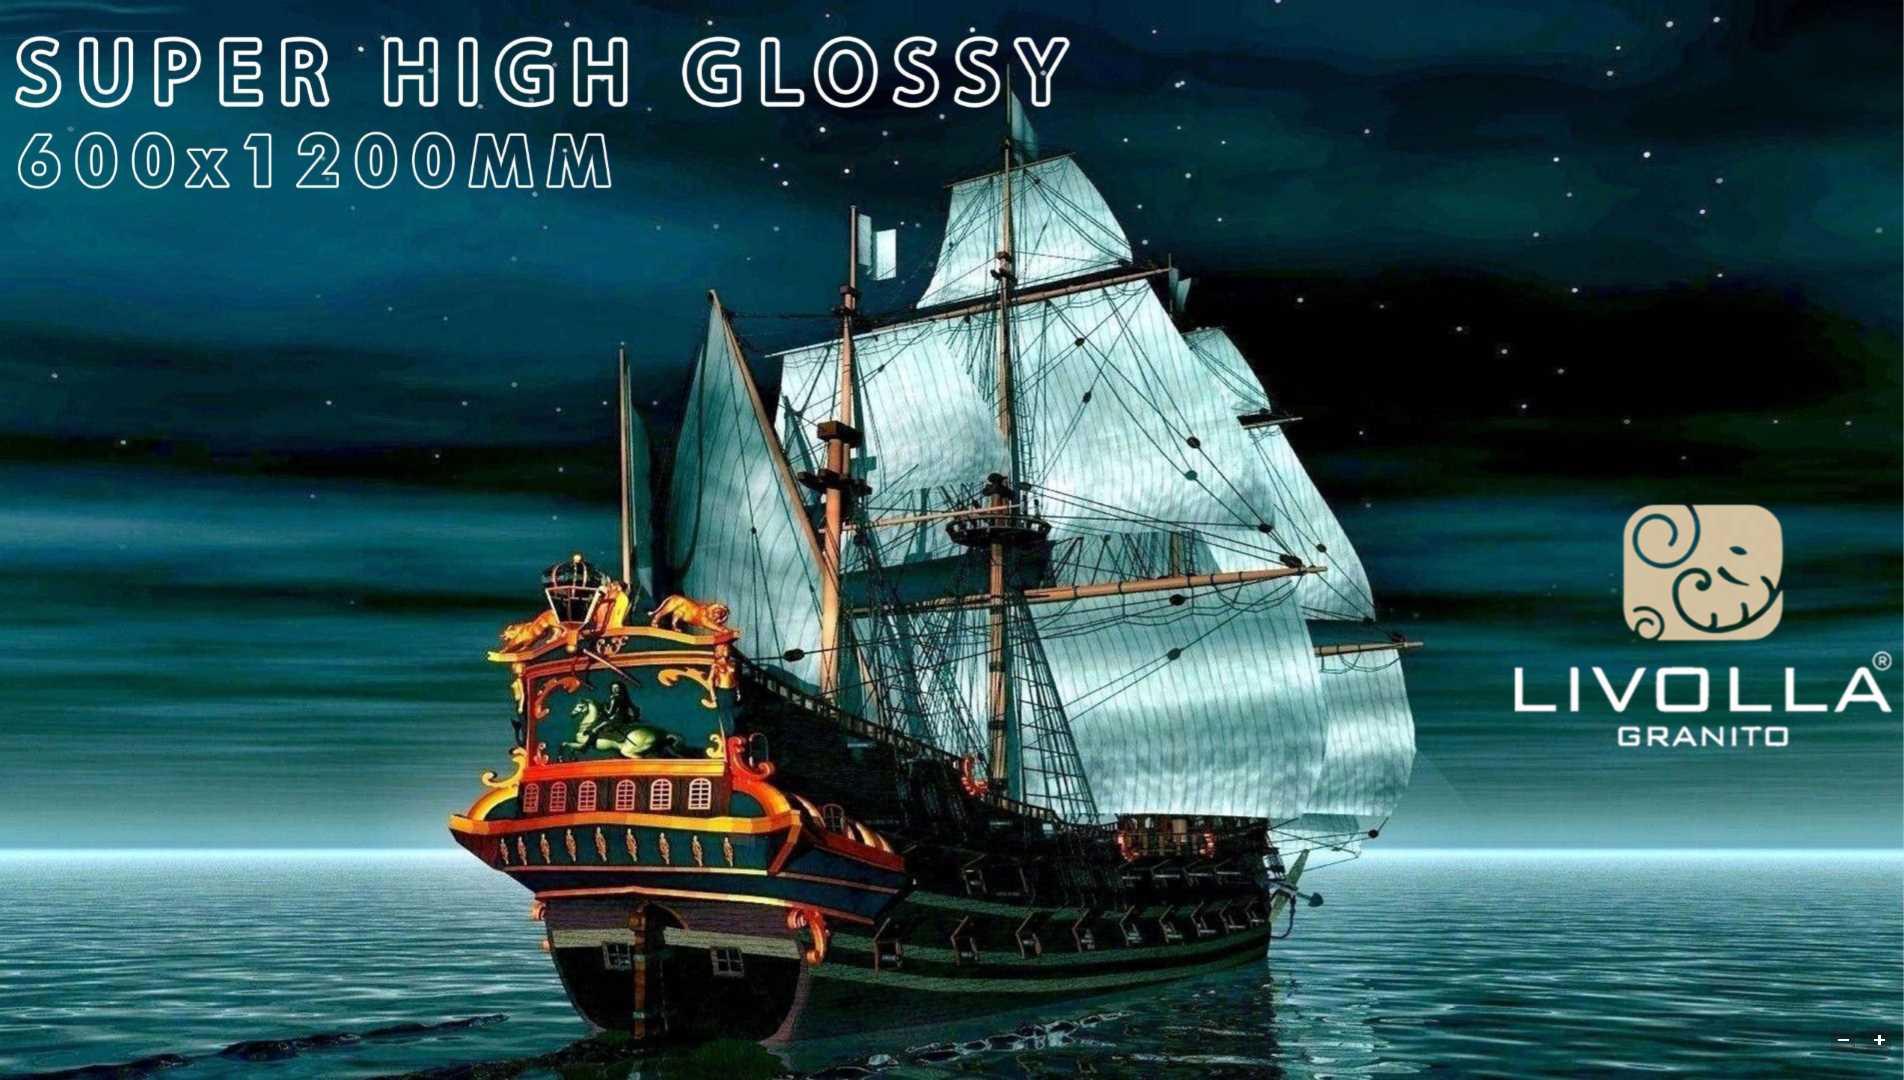 600x1200 Super High Gloss Series